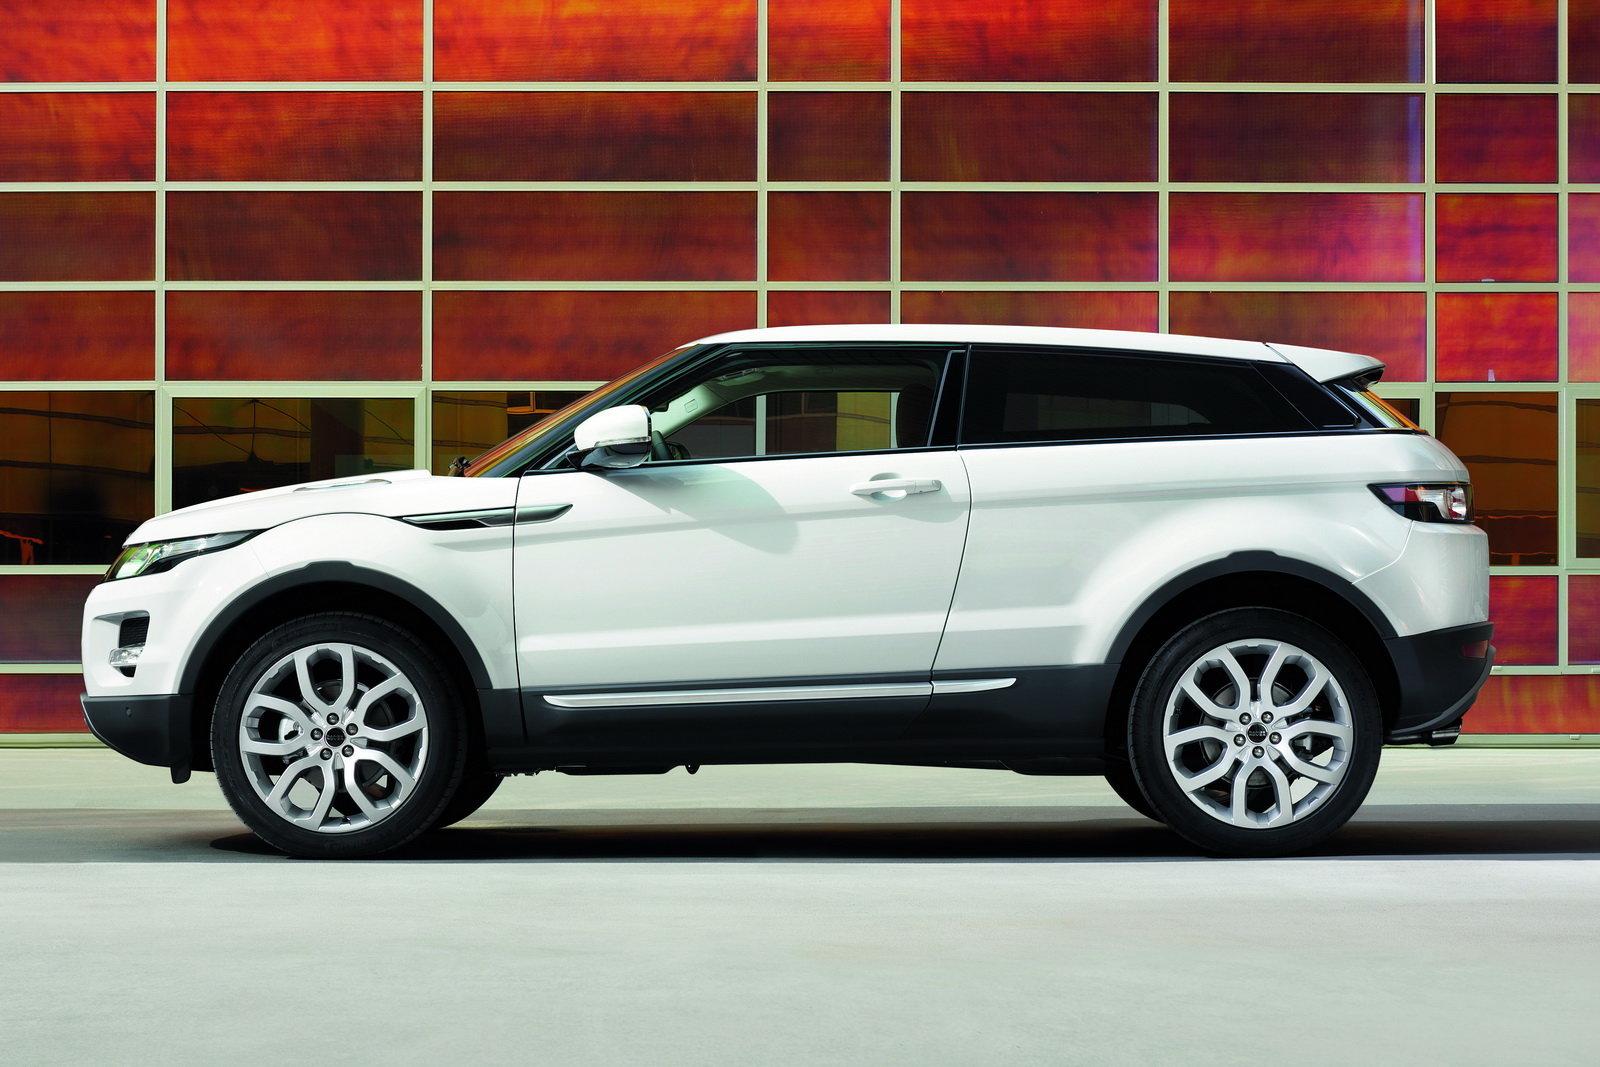 2 Door Range Rover >> Foto - Range Rover Evoque, svelati gli interni